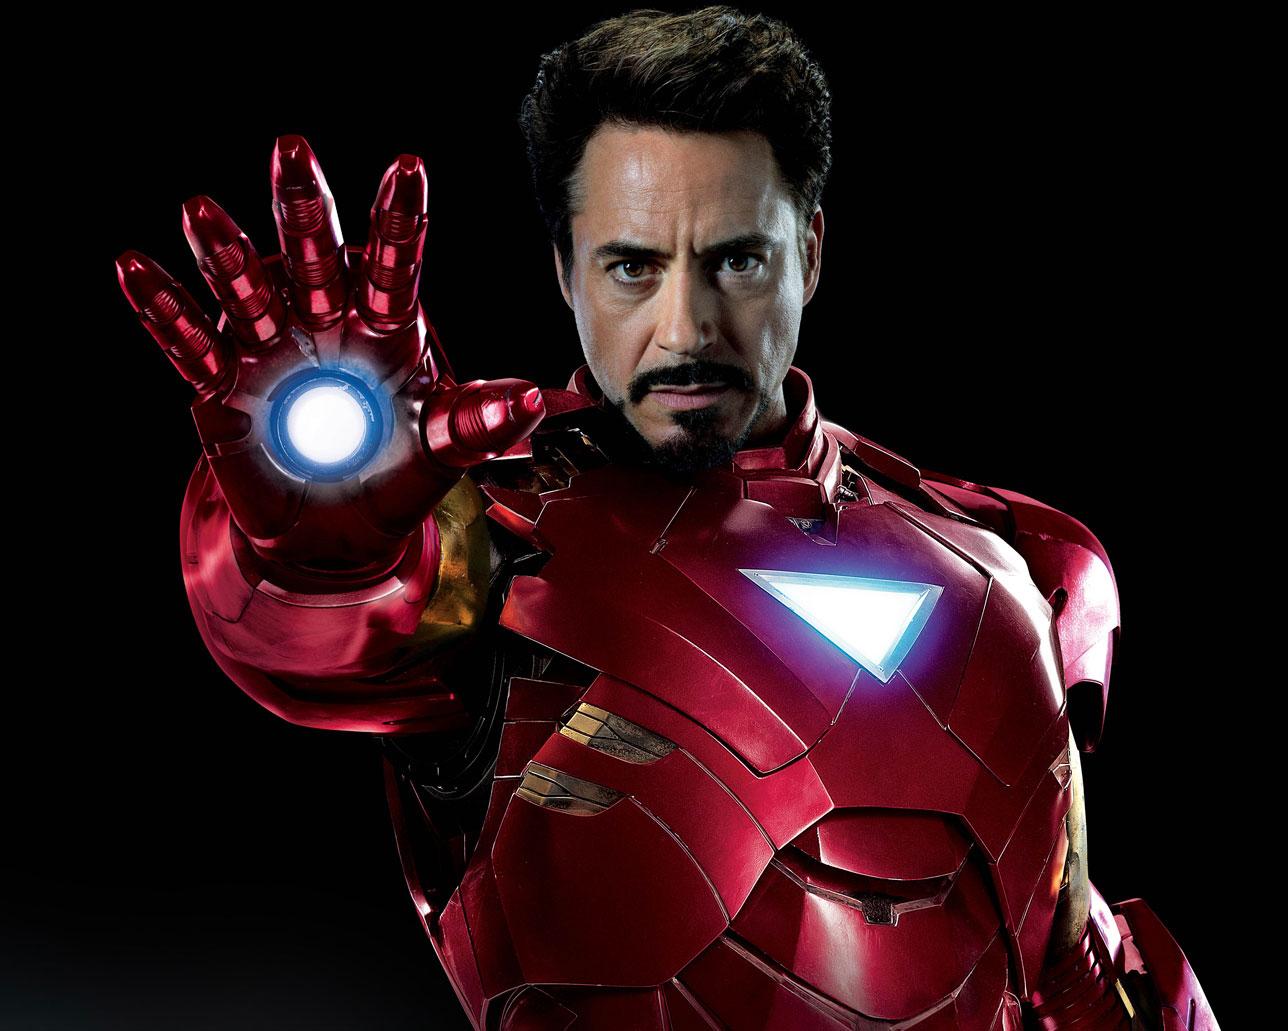 Iron man 3 plot released